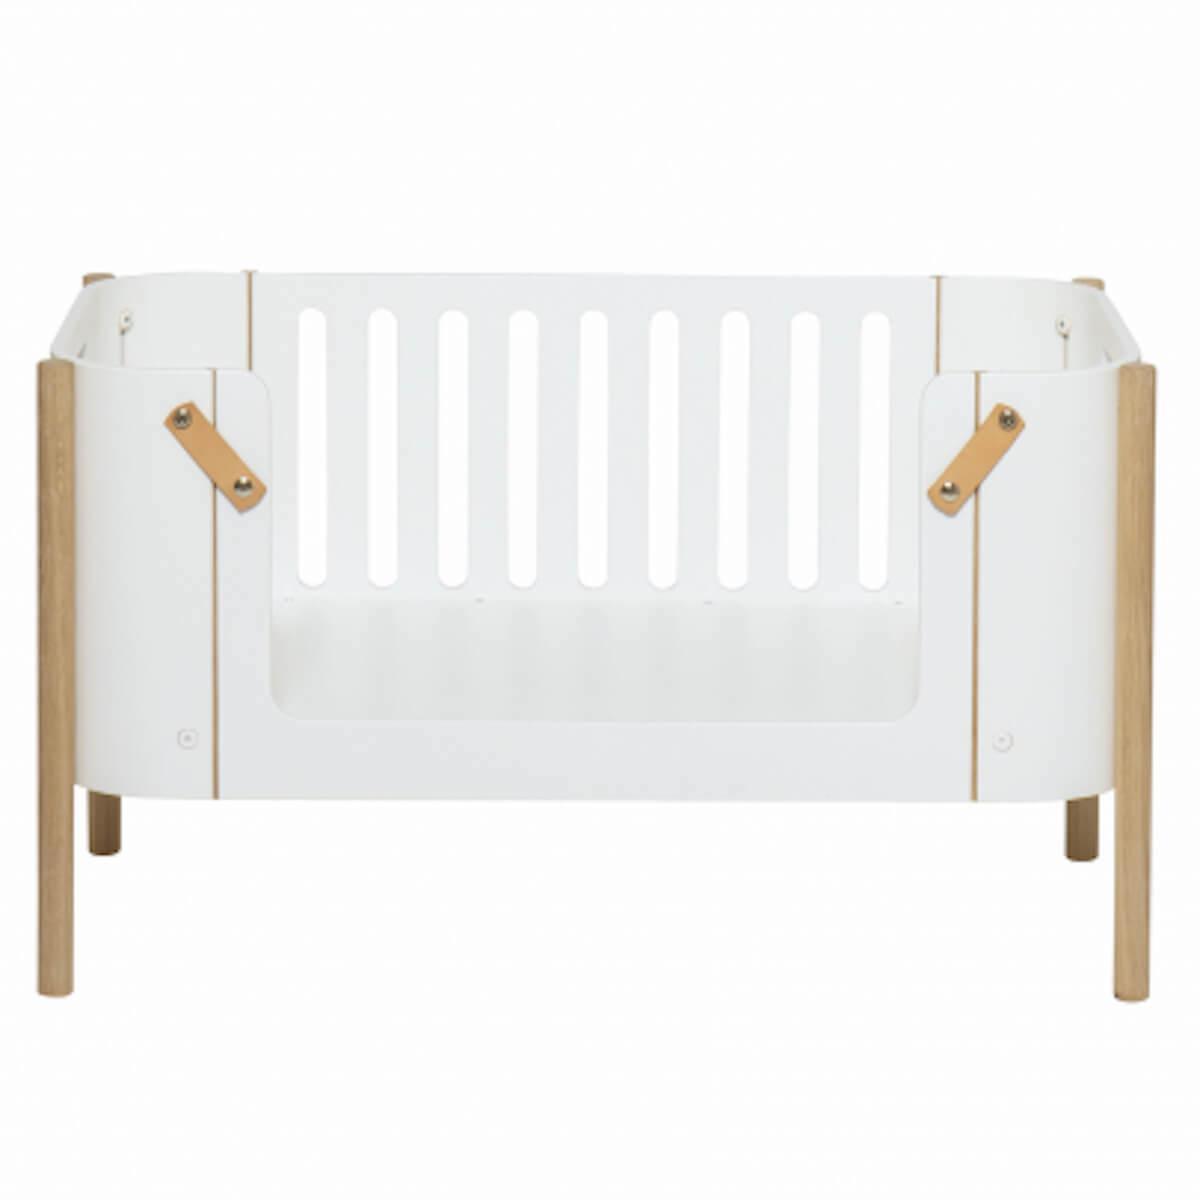 Banquette 42x82cm WOOD BANK Oliver Furniture chêne-blanc